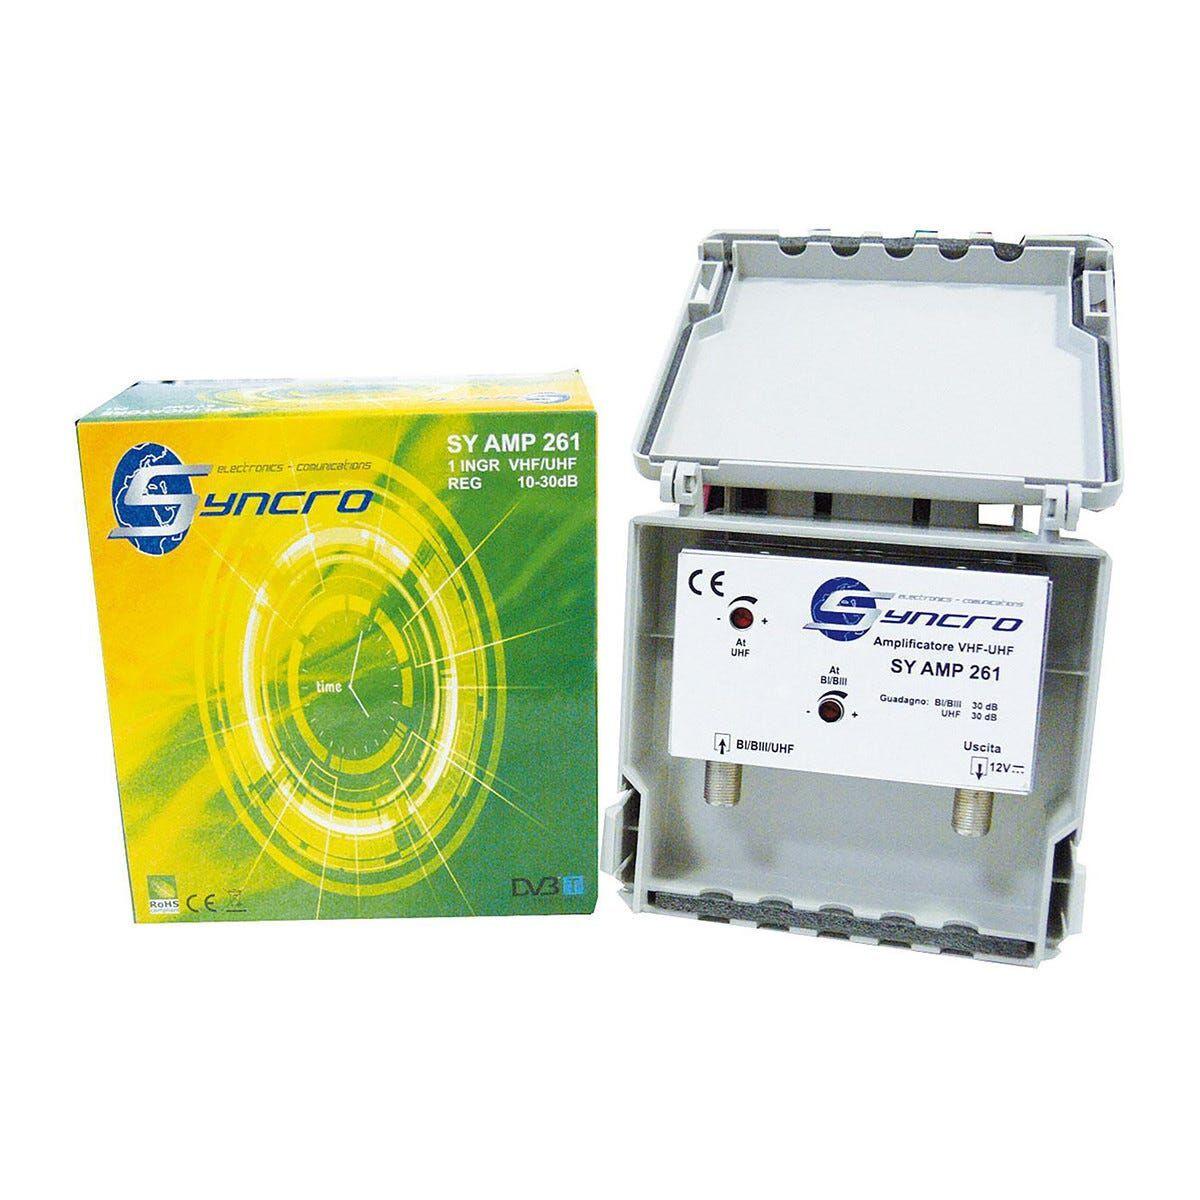 Amplificatore Da Palo 1 Ingresso Frequenze 174 - 790 Mhz 28 Db